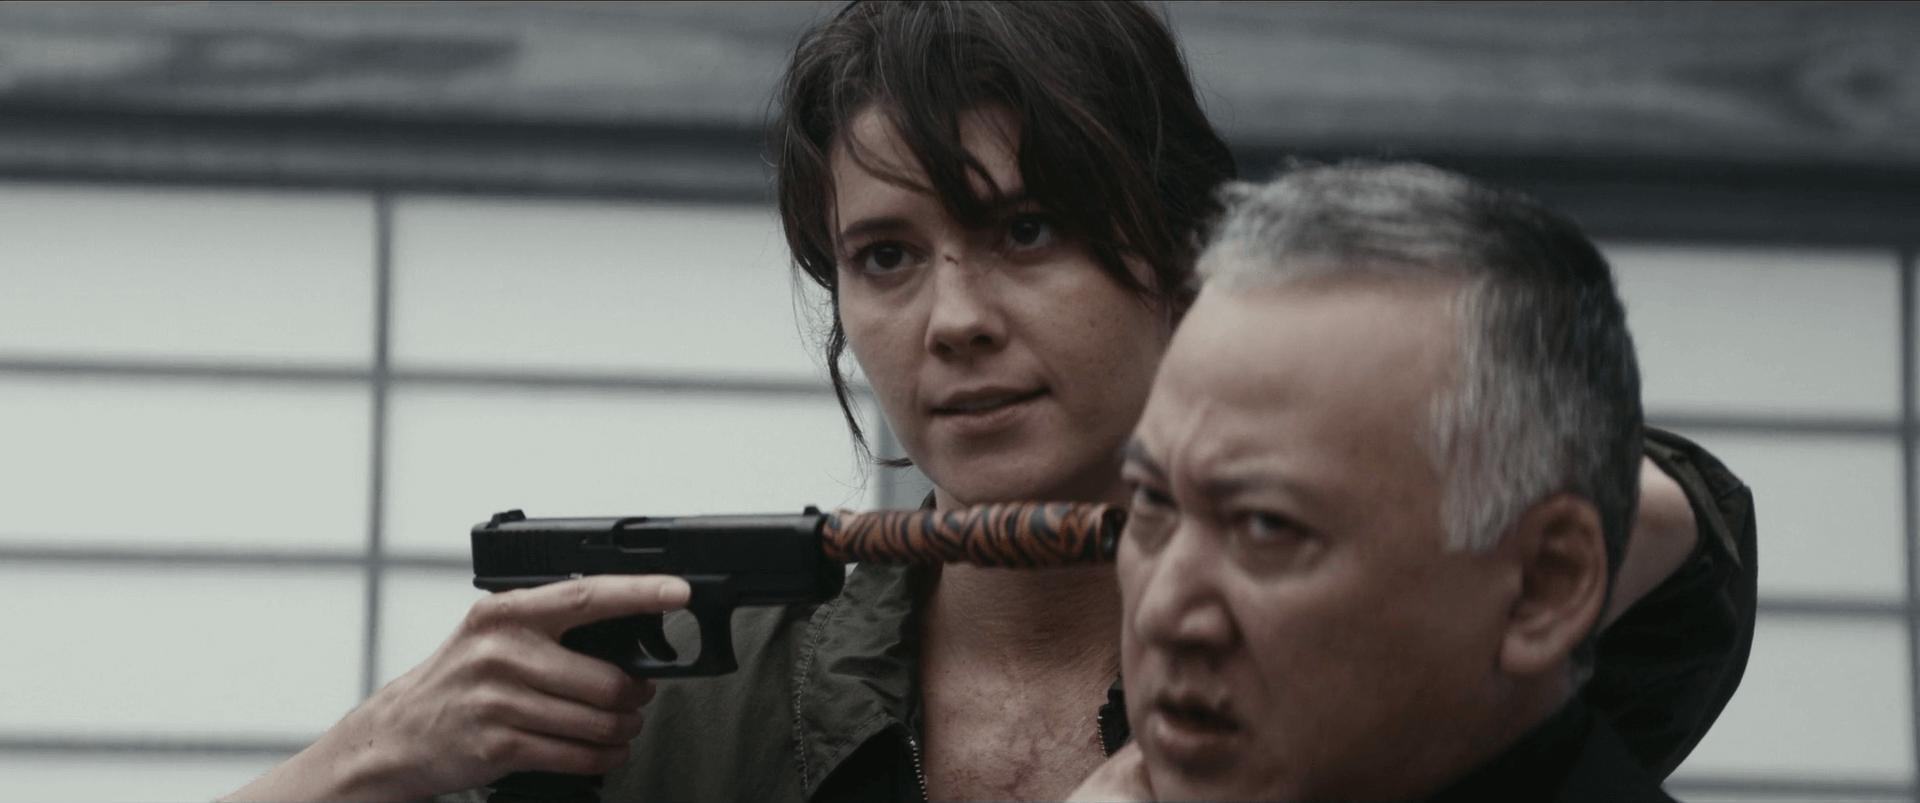 Mary-Elizabeth-Winstead-Kate-Netflix-movie